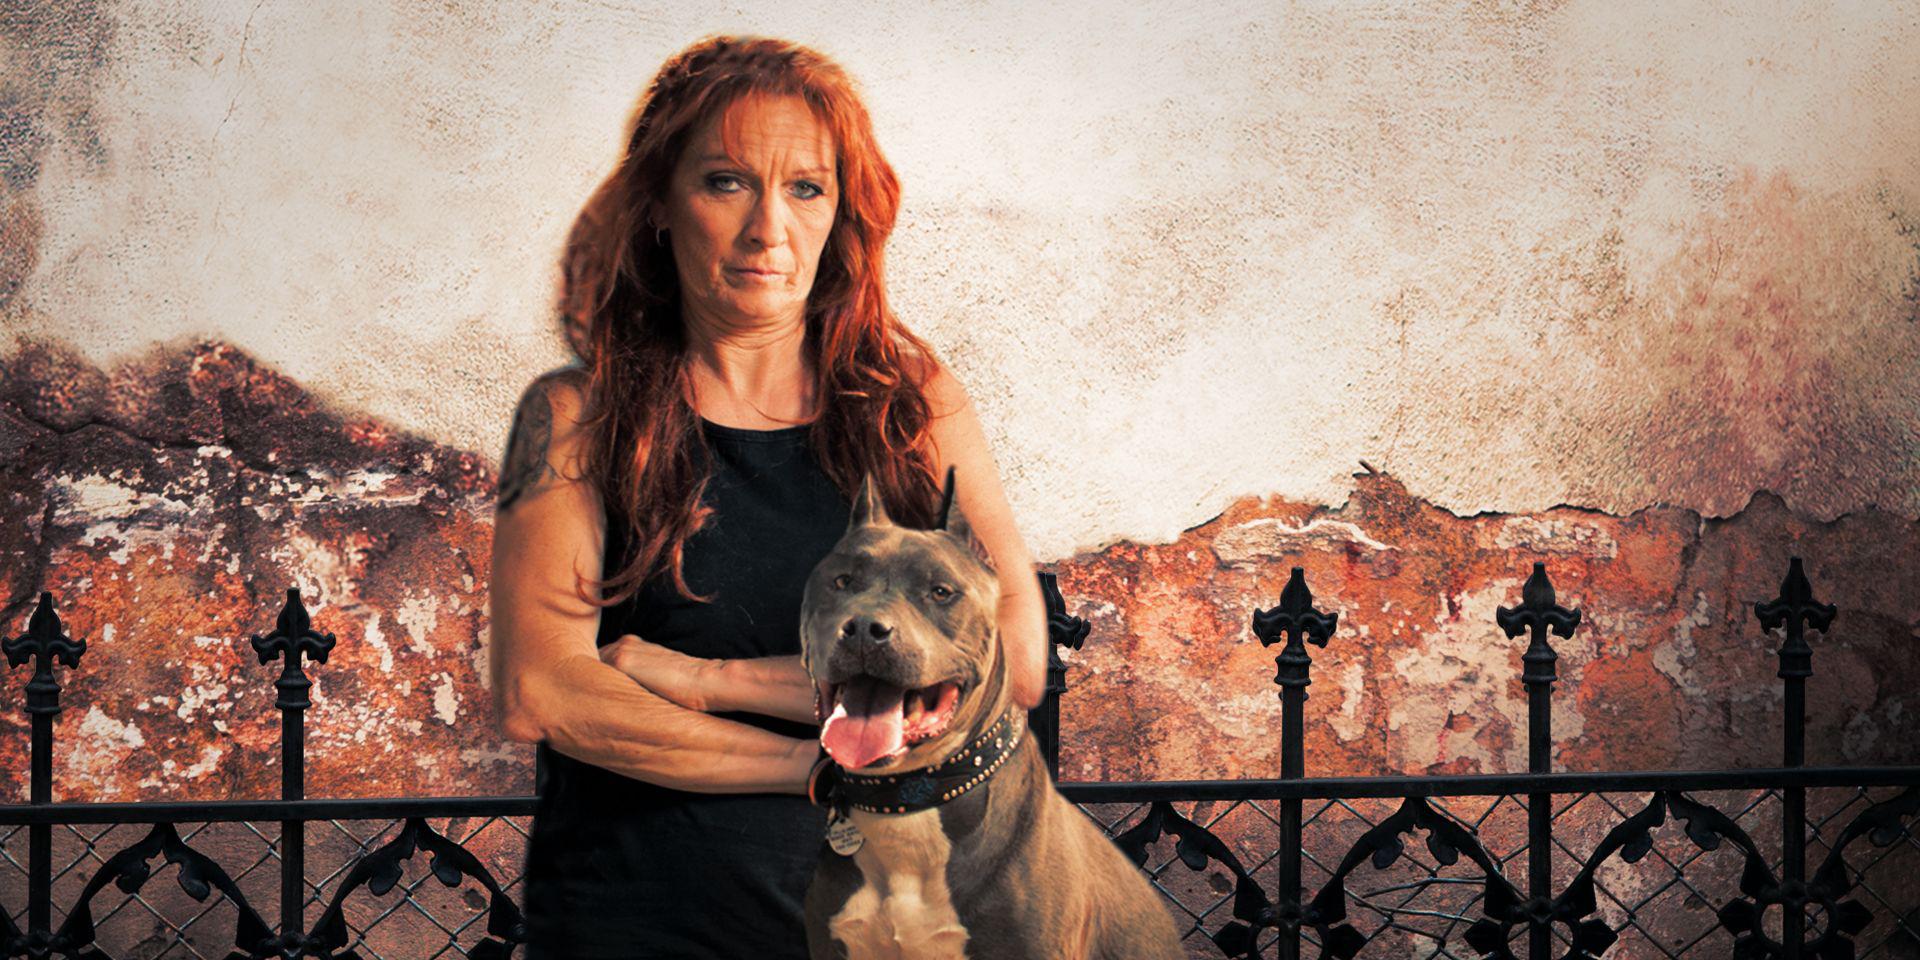 Pit Bulls and Parolees- Tia Maria's love for animals